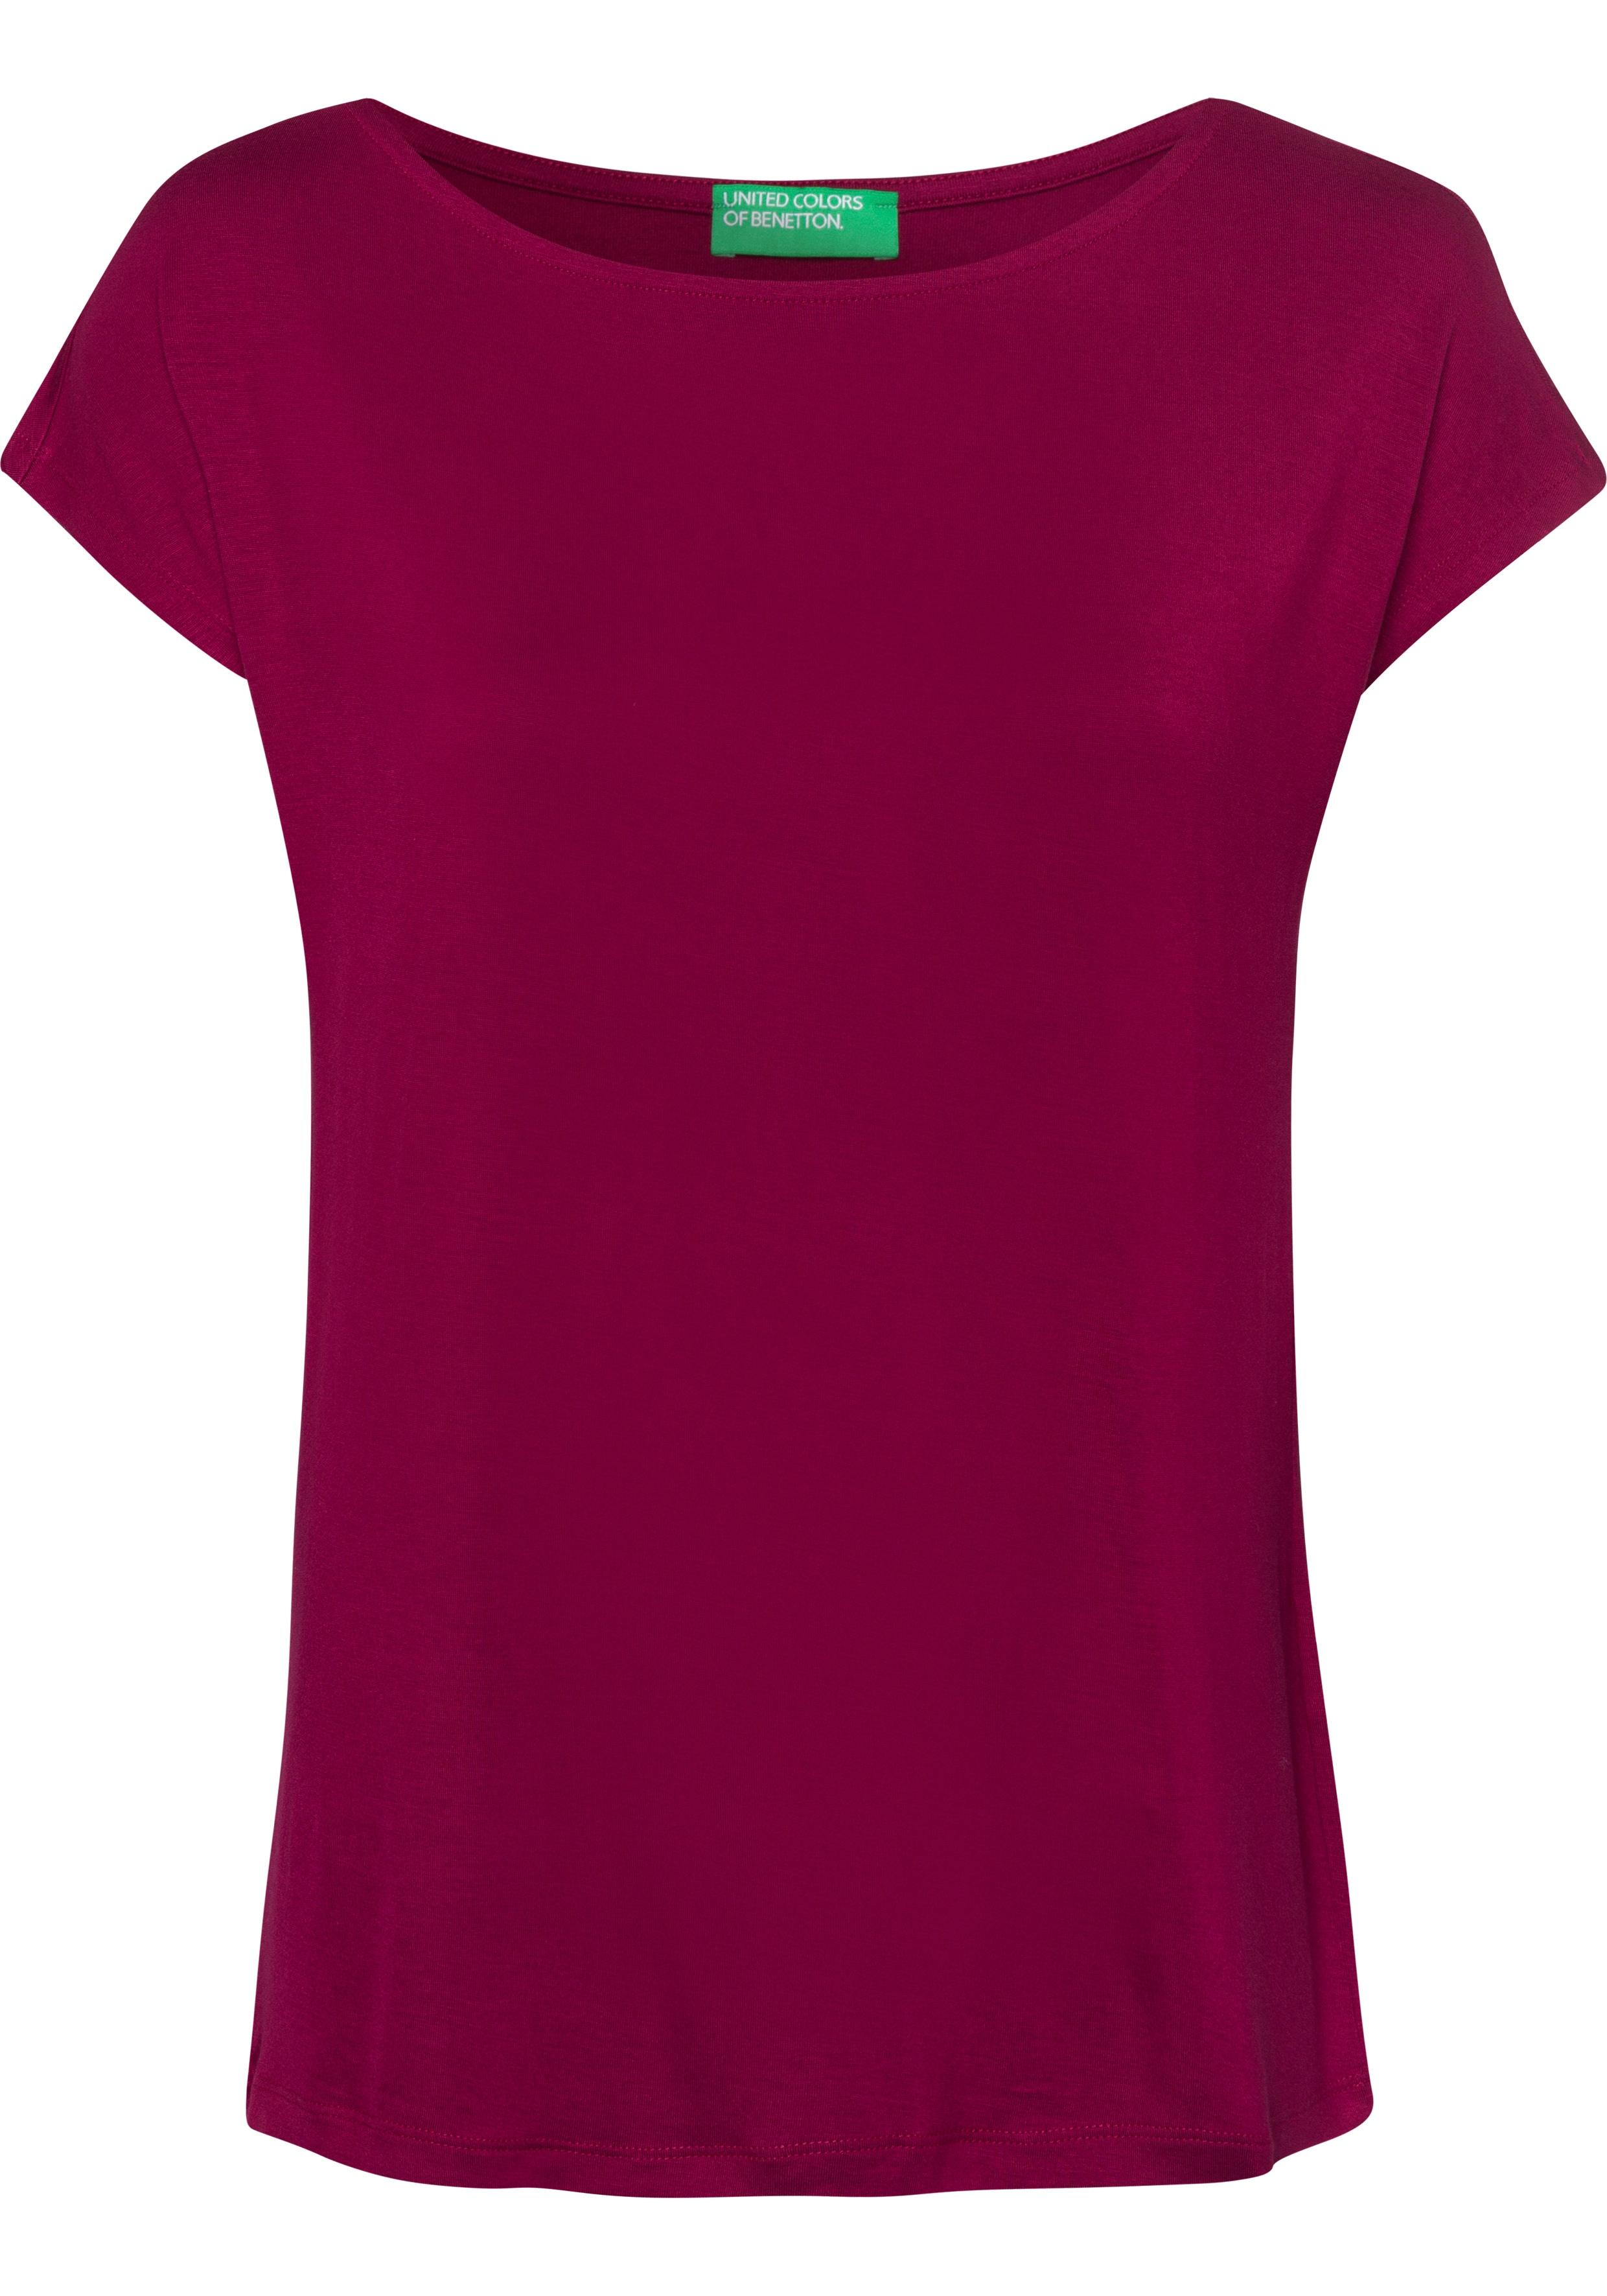 united colors of benetton -  Kurzarmshirt